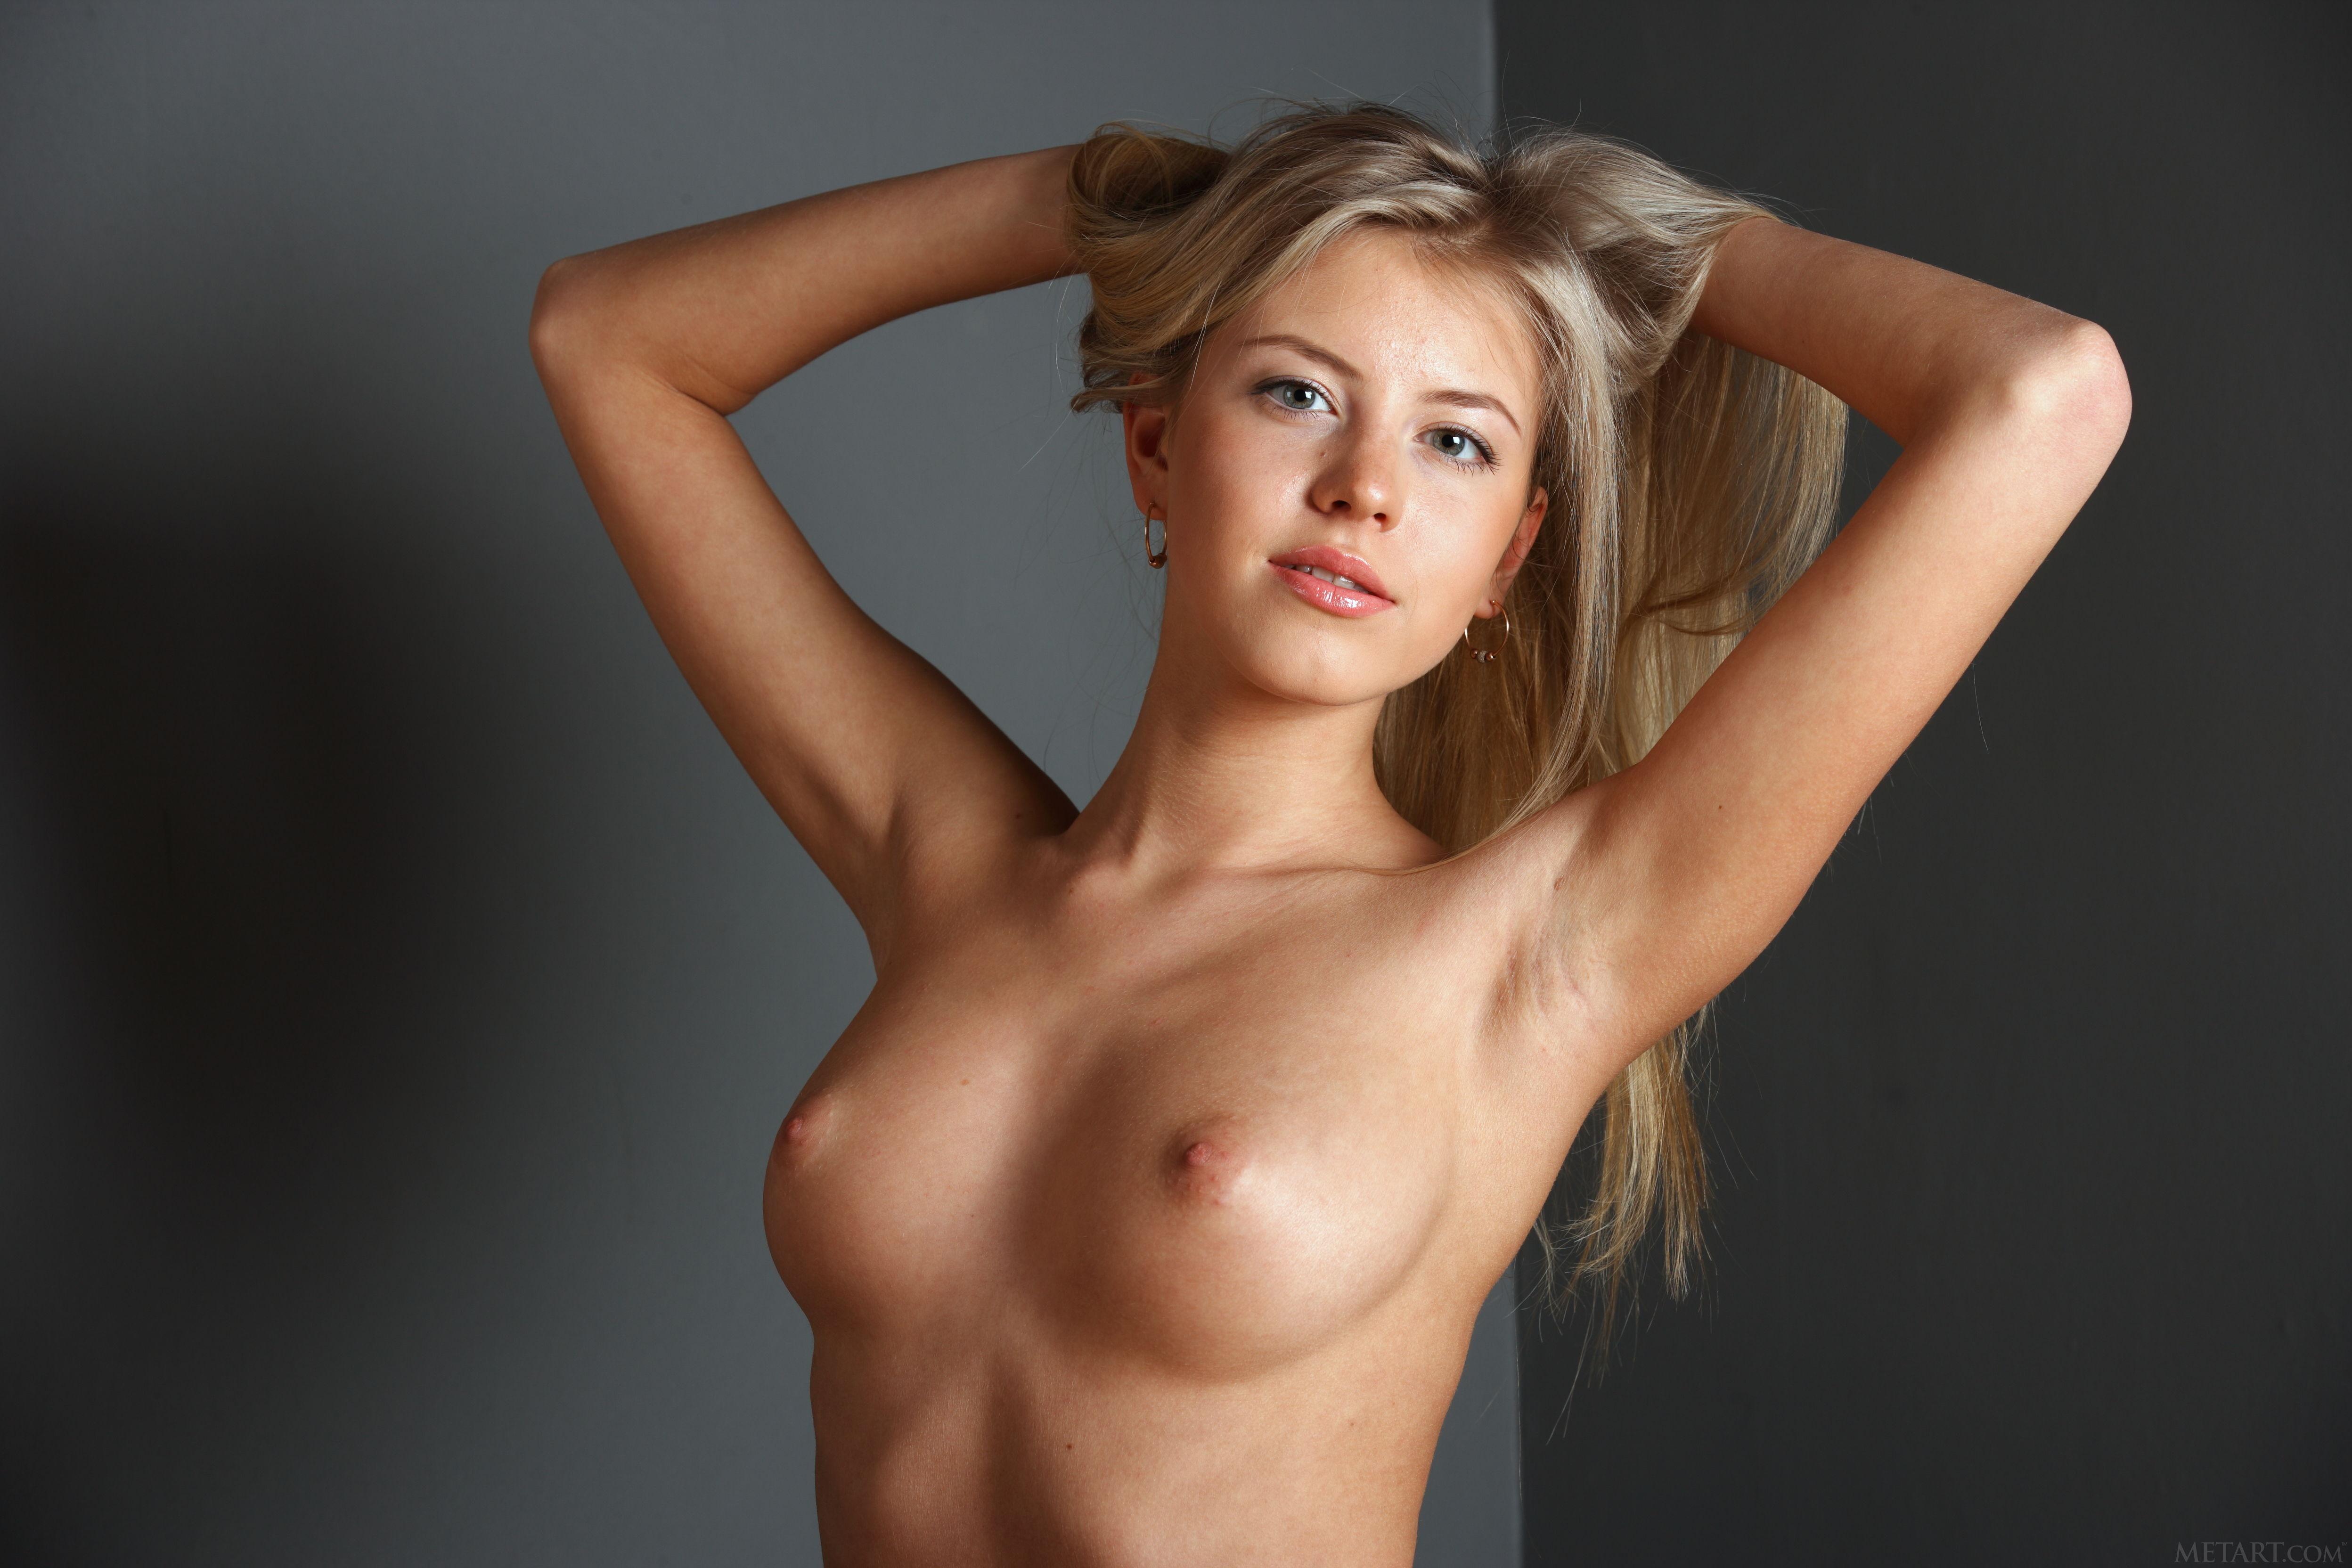 Nice russian girl nice bj 3